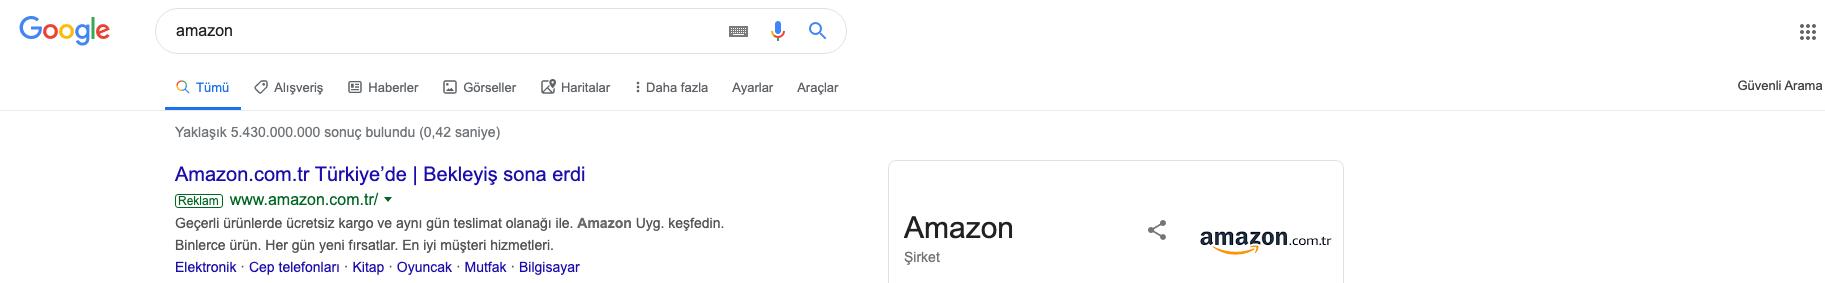 Dijitalzade.com Google ads arama ağı